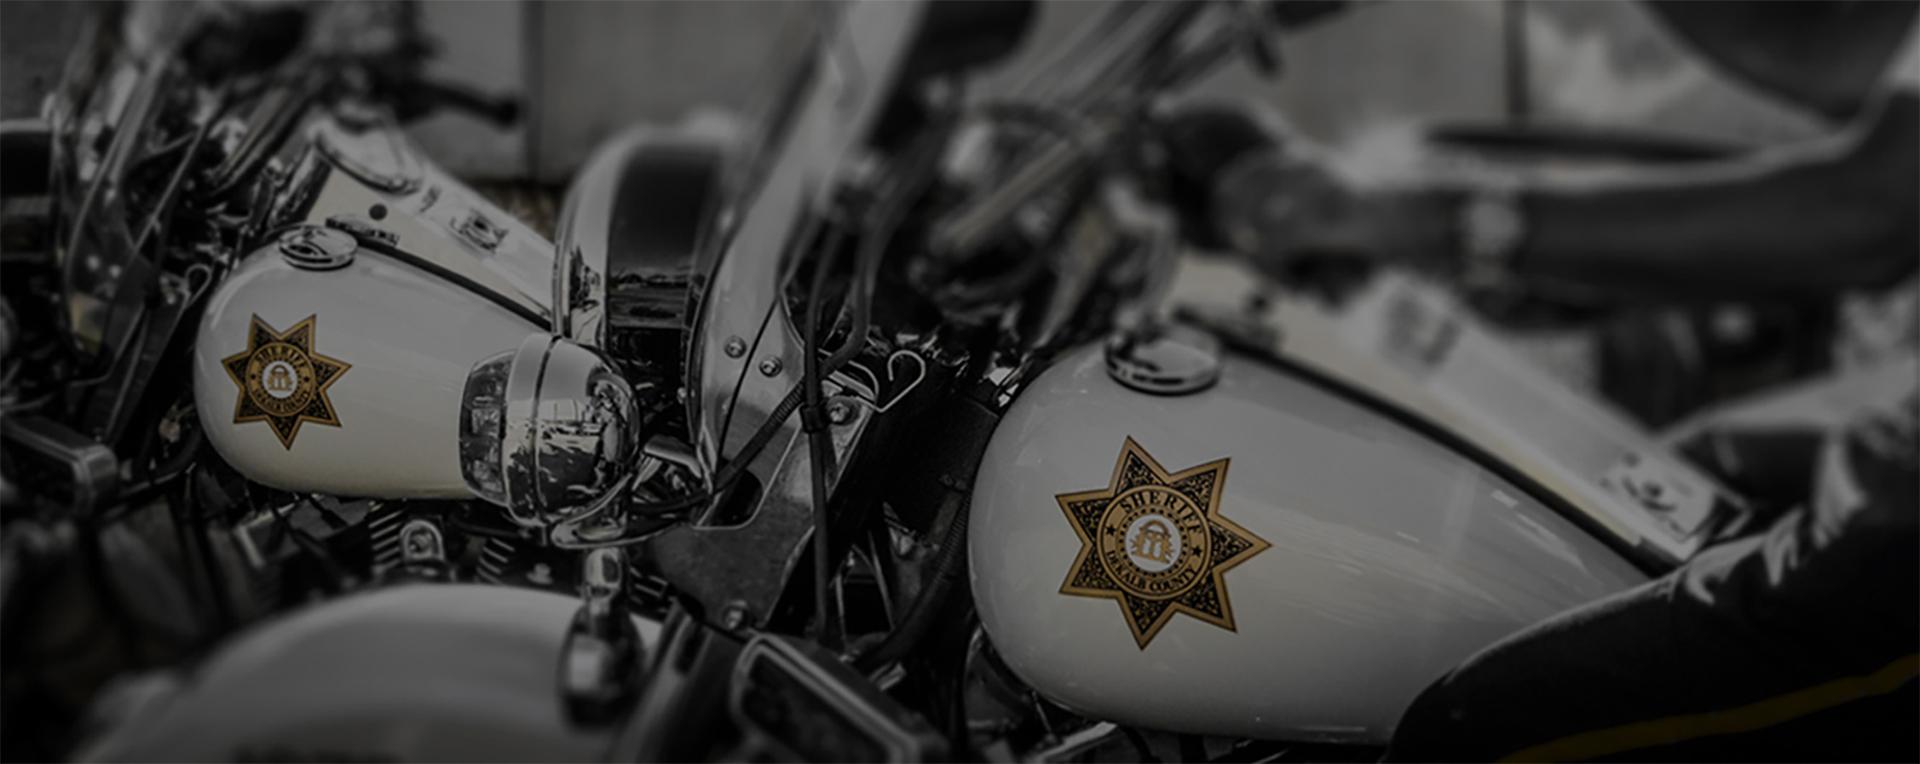 Dekalb County Sheriff